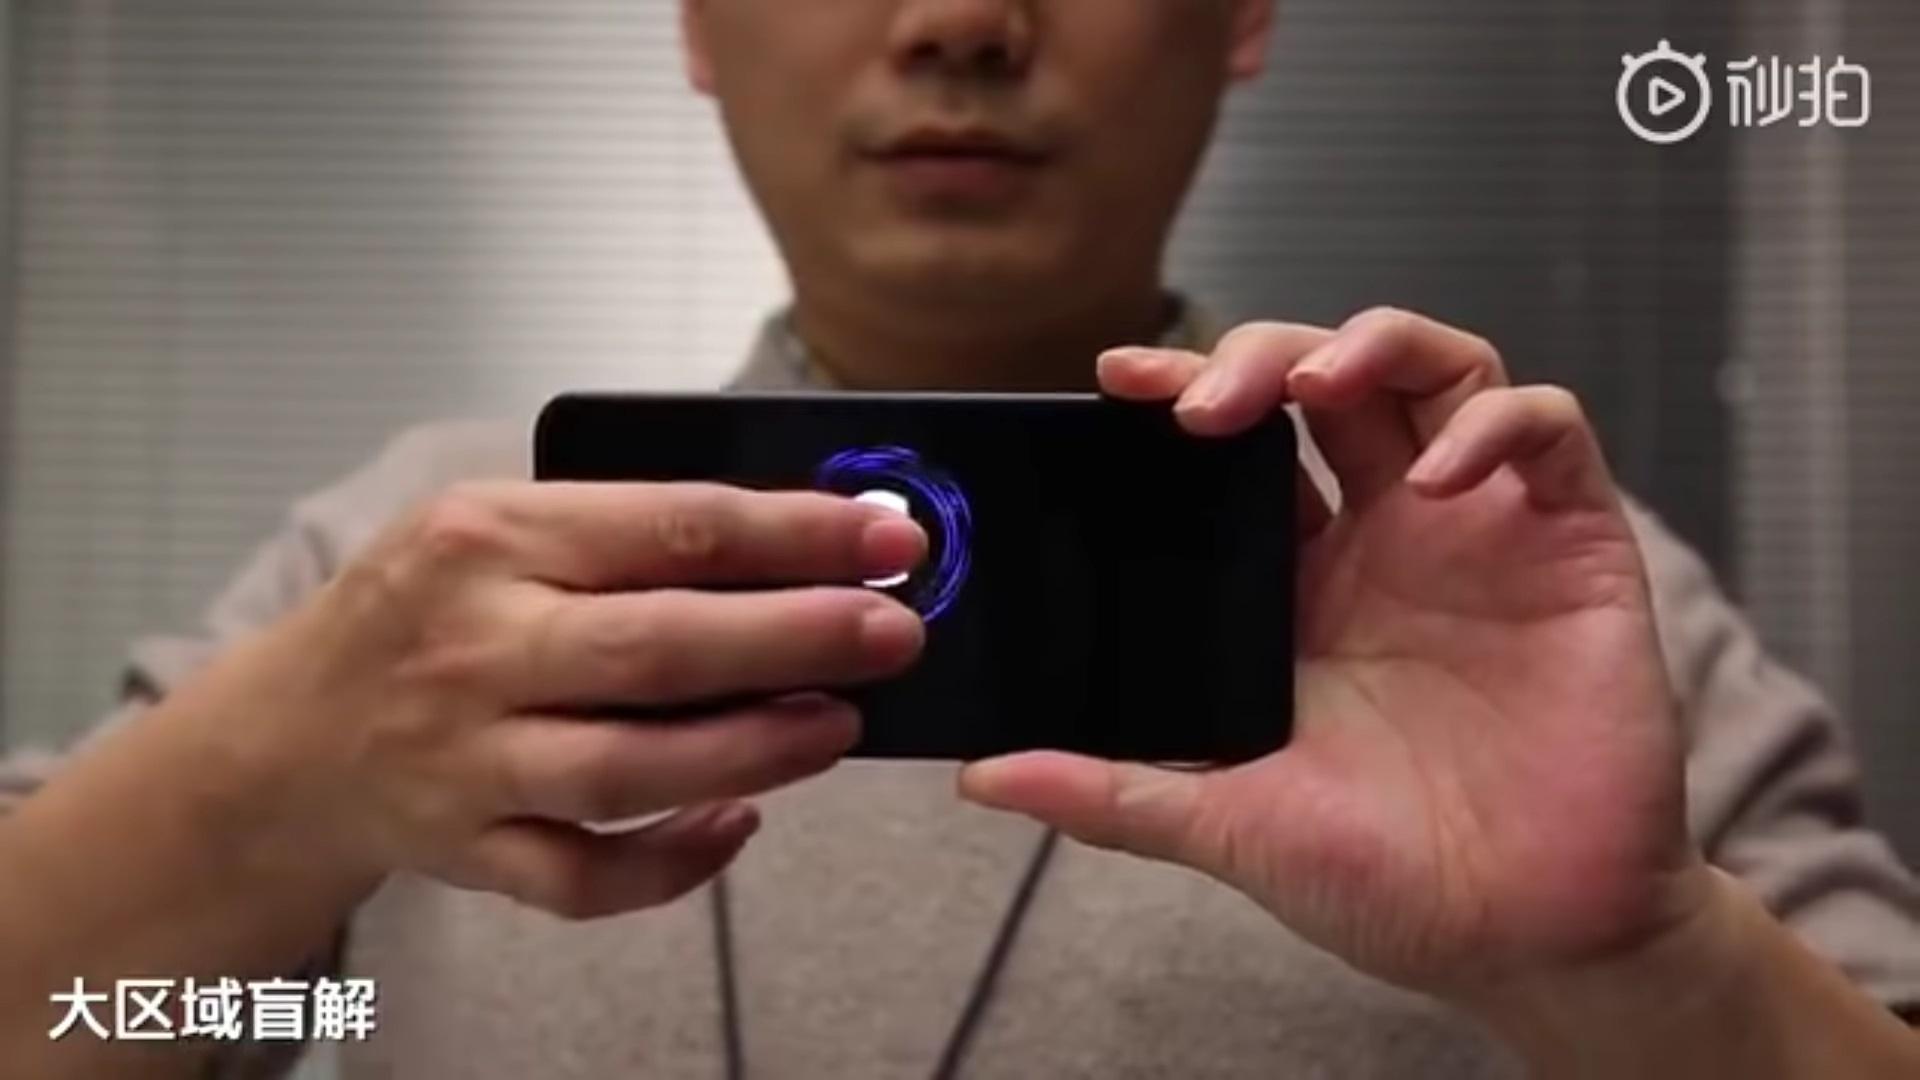 Xiaomi-CEO-demonstriert-displayf-llenden-Fingerscanner